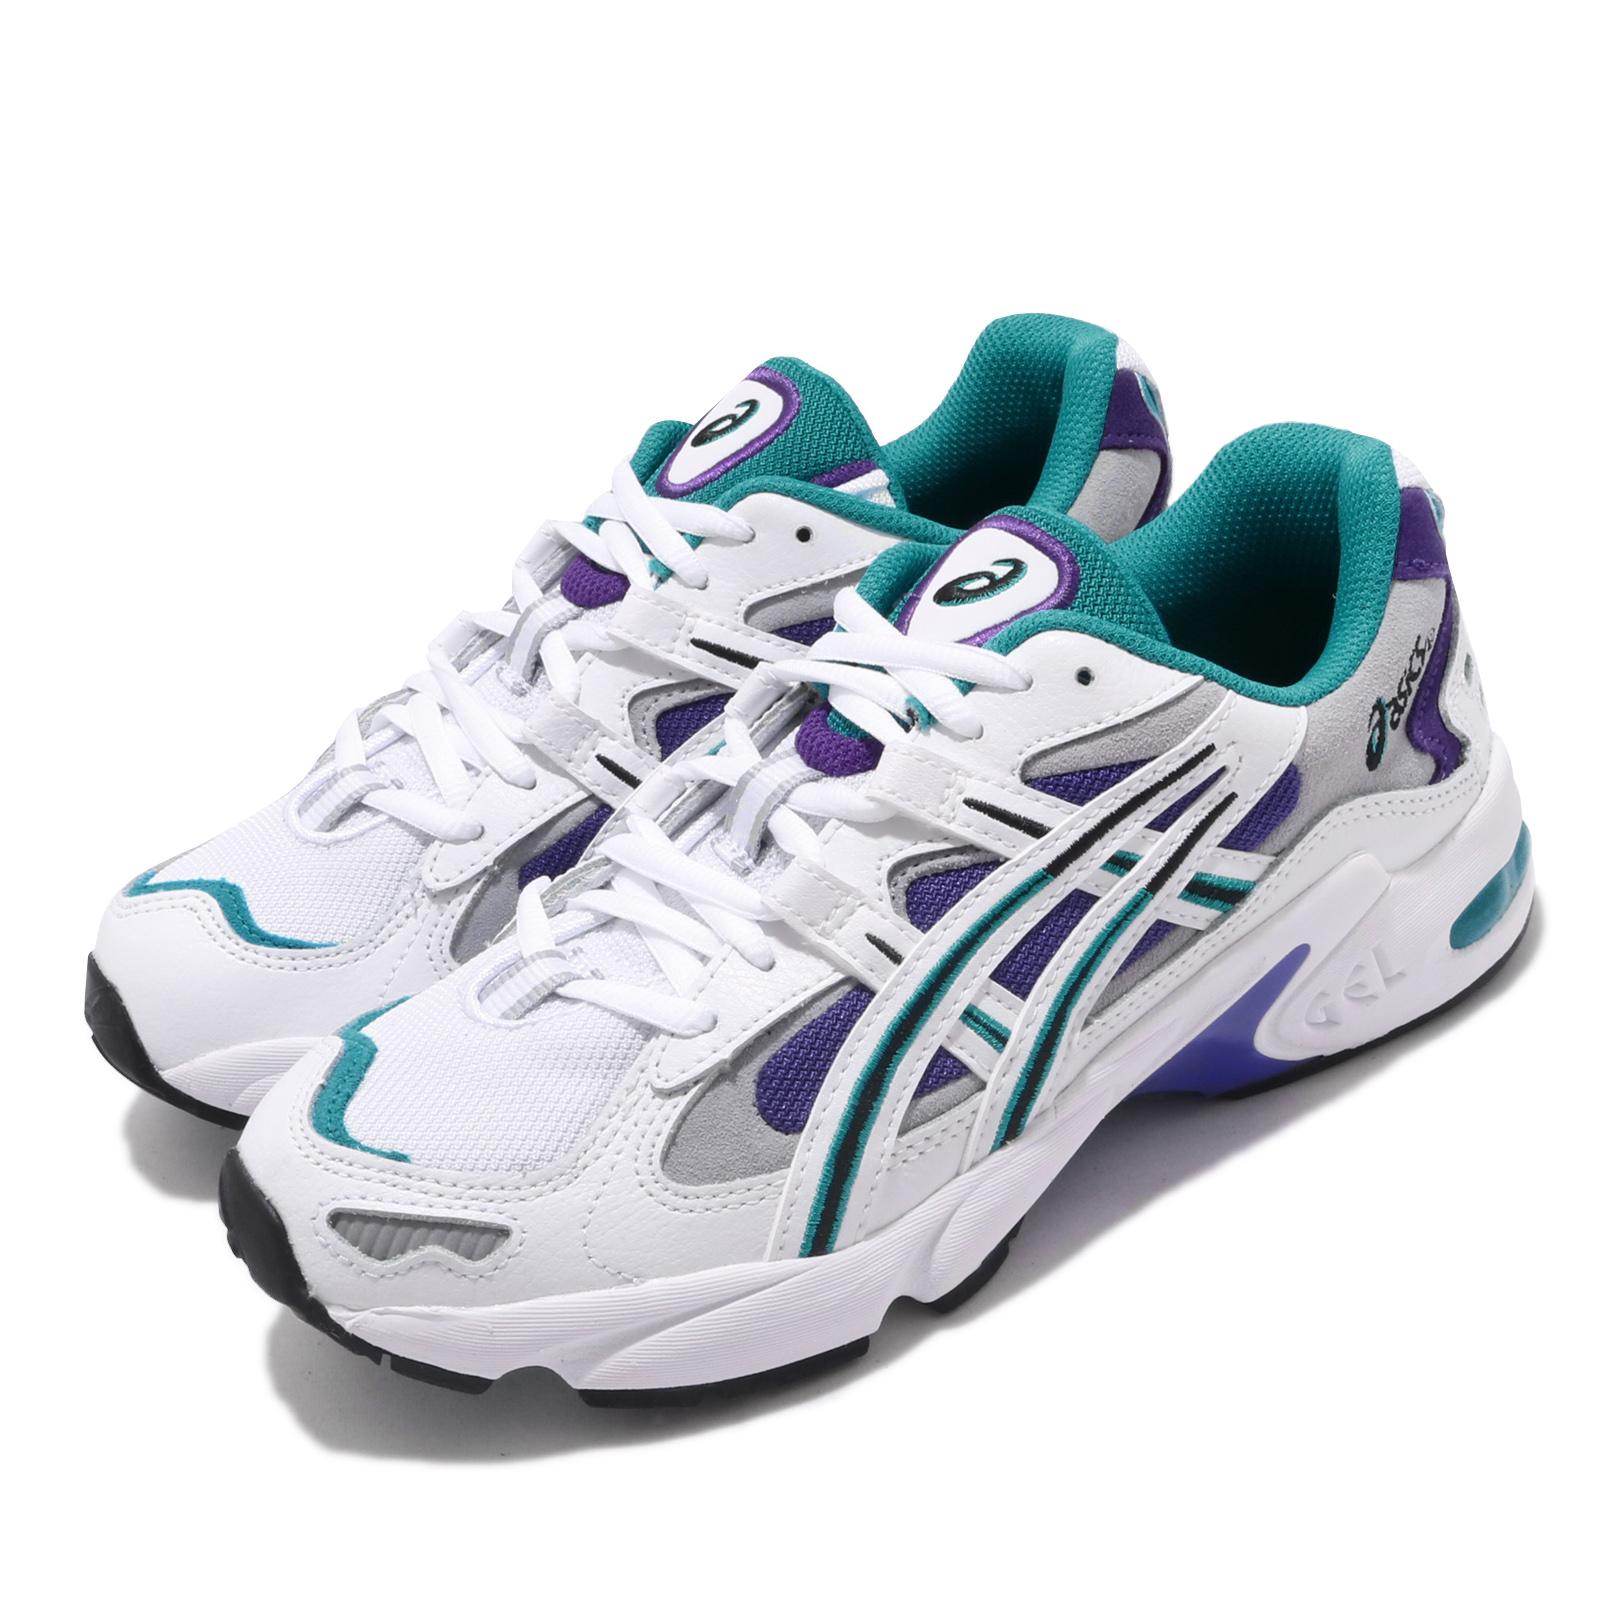 Asics 休閒鞋 Gel-Kayano 5 OG 復刻 女鞋 1022A142101